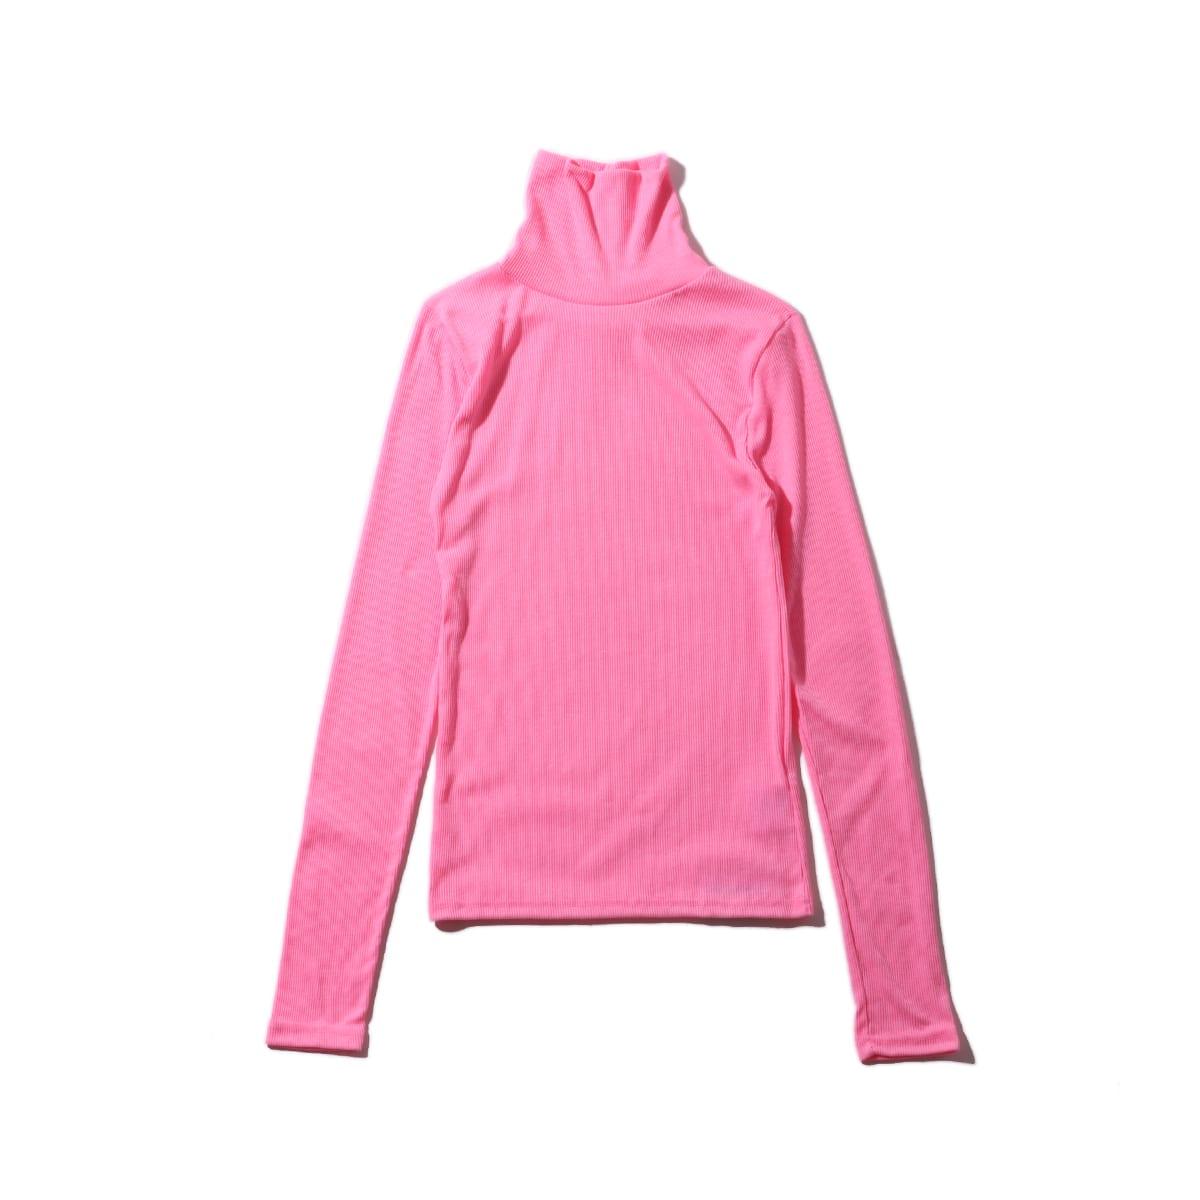 """atmos pink カラフル タートルネック PINK 19SP-I""_photo_2"